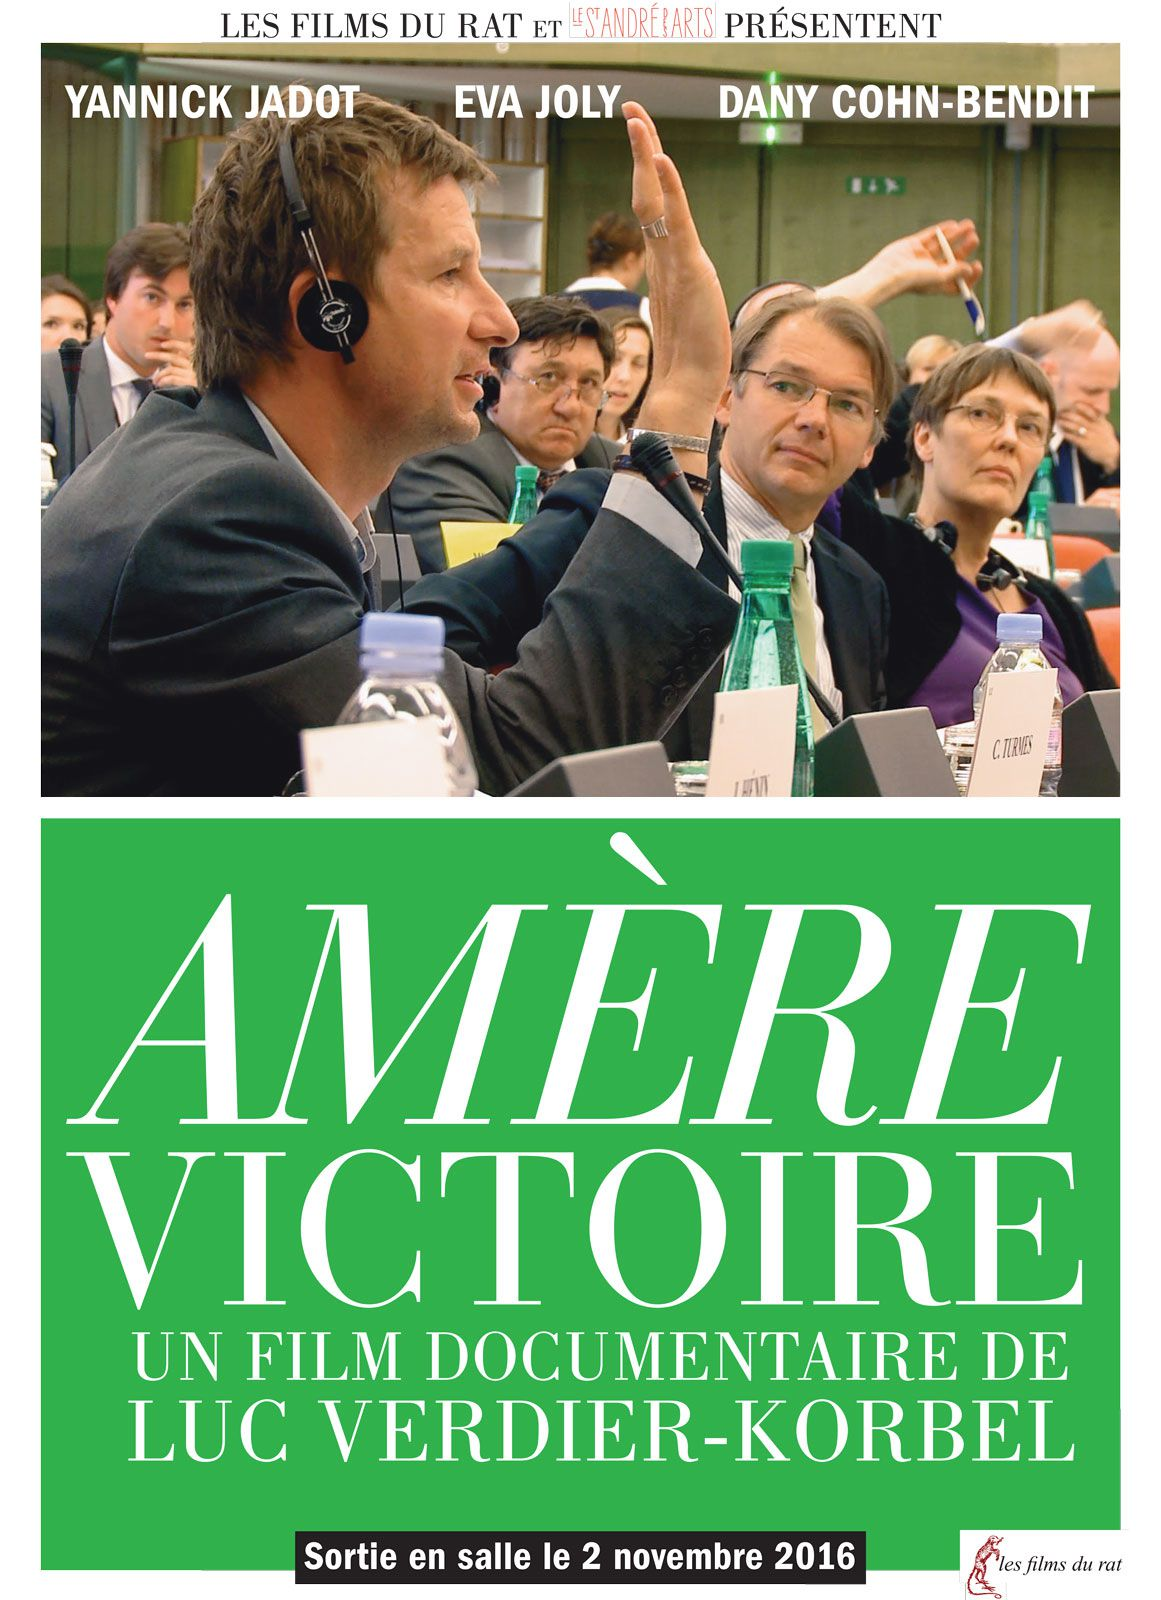 Amère victoire - Documentaire (2016)